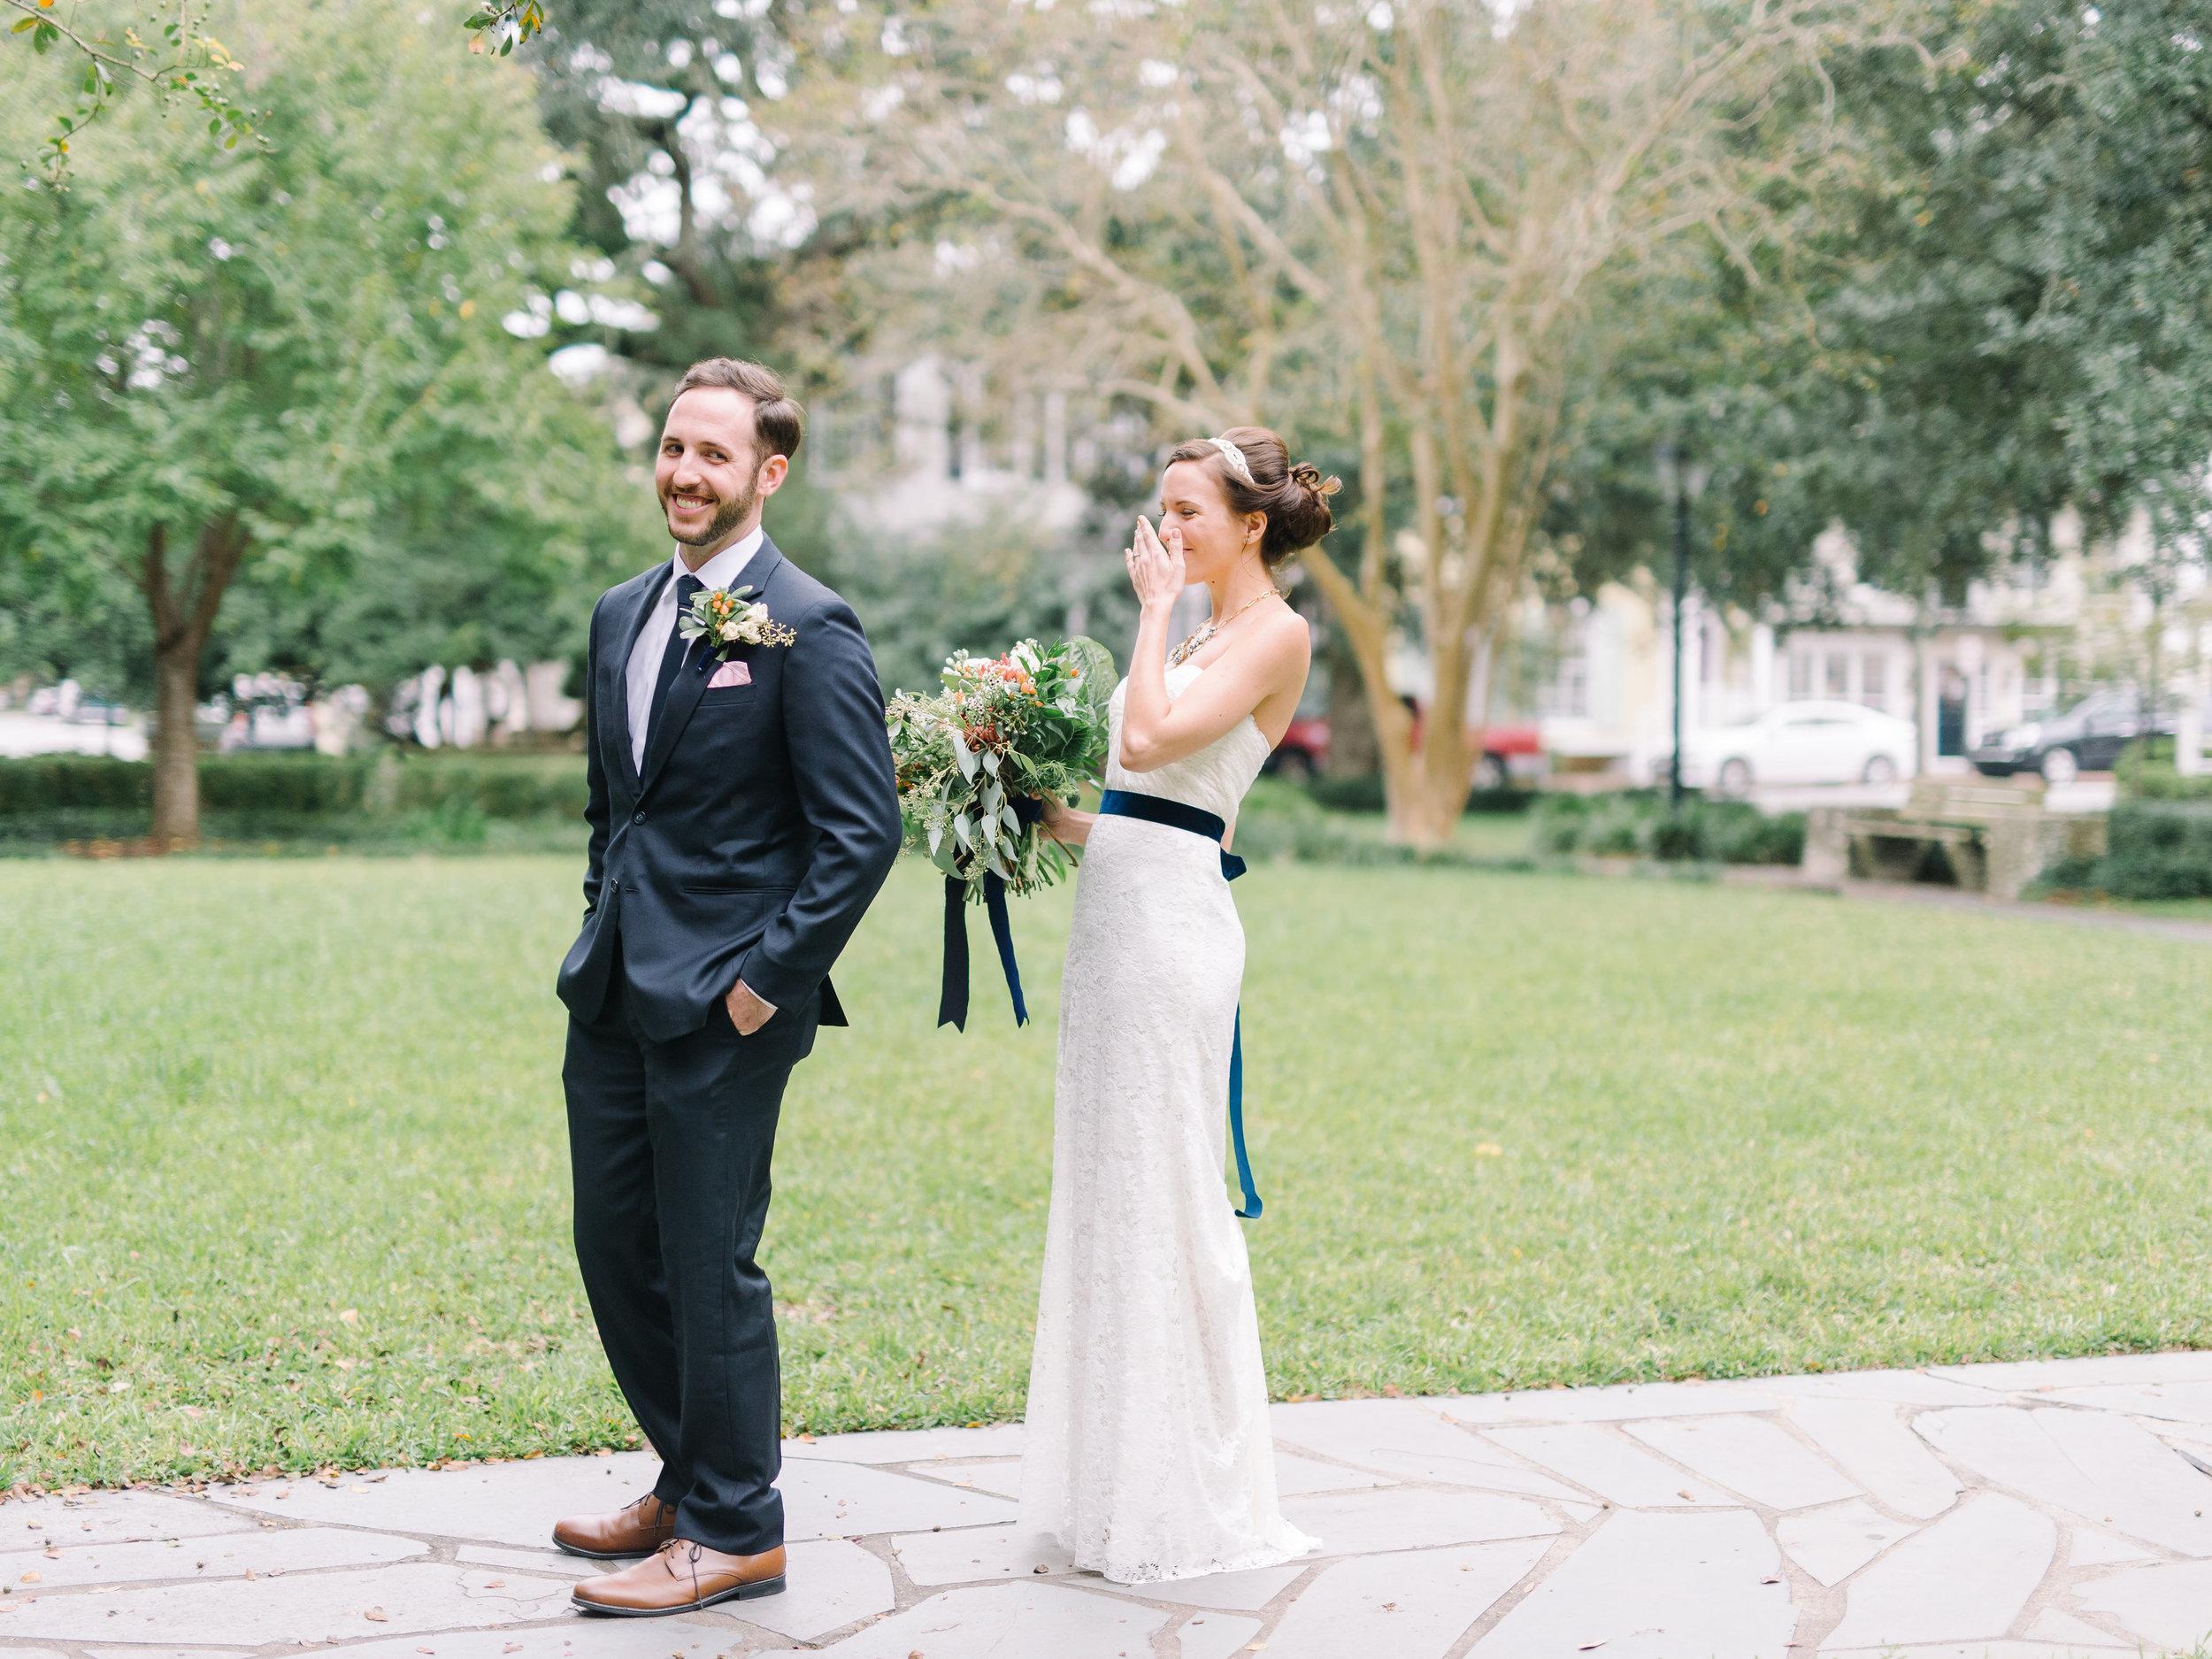 amber-and-paul-rach-loves-troy-charles-h-morris-center-wedding-sarah-seven-helene-lace-wedding-dress-ivory-and-beau-bridal-boutique-savannah-wedding-planner-savannah-event-designer-savannah-florist-savannah-weddings-savannah-bridal-boutique-8.jpg